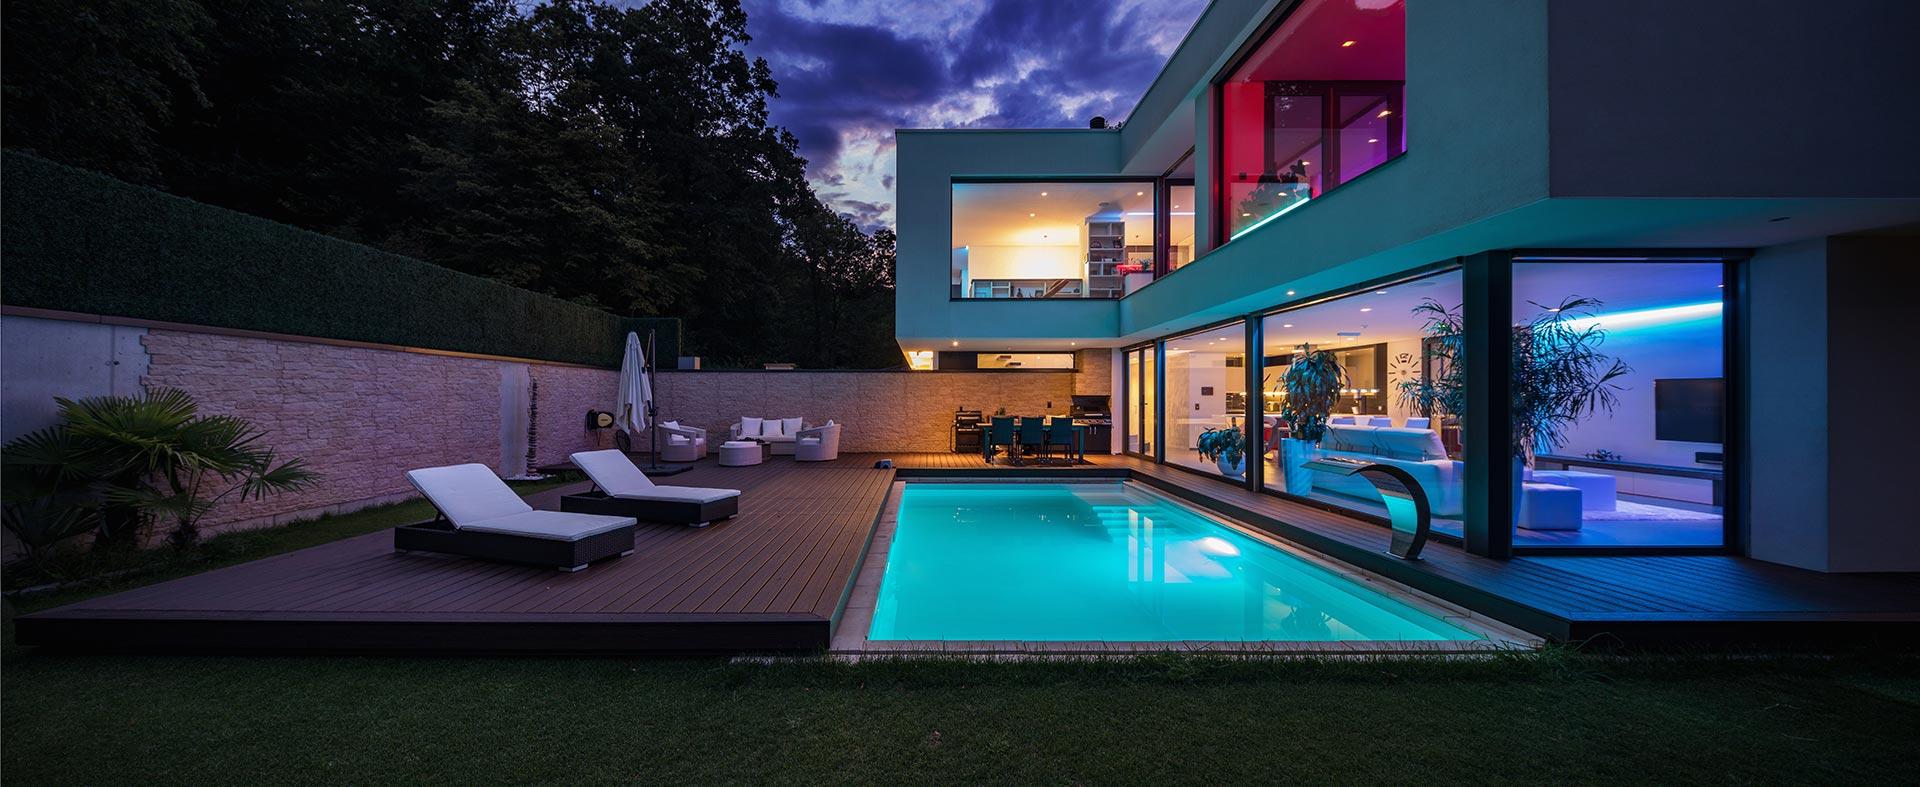 lighting control smart homes